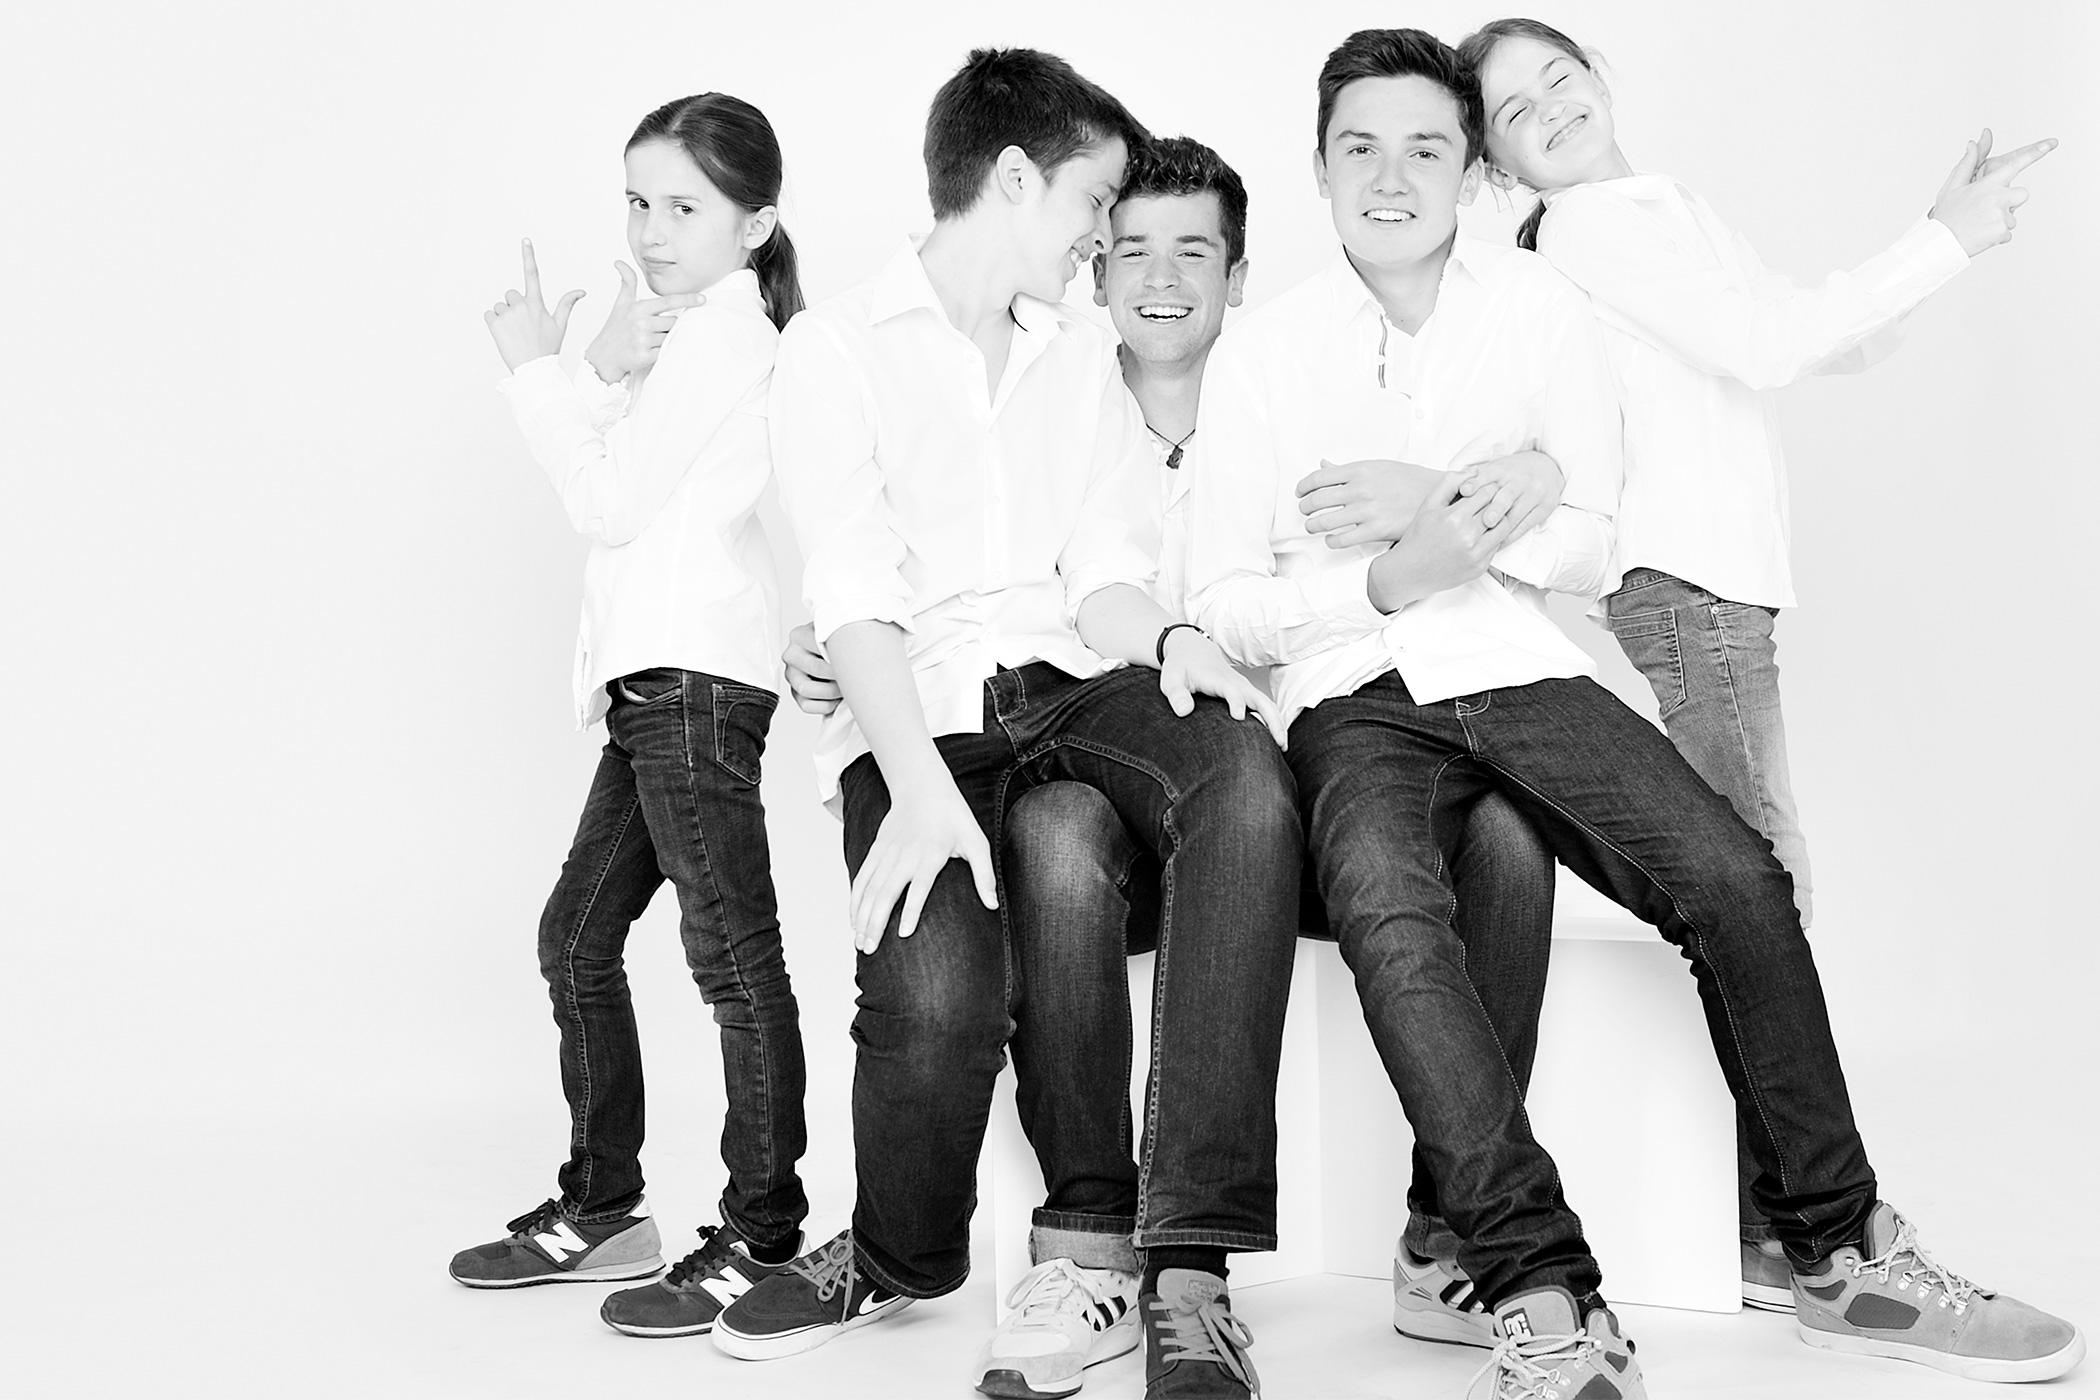 Myriam Topel Fotografie - Familienfotos